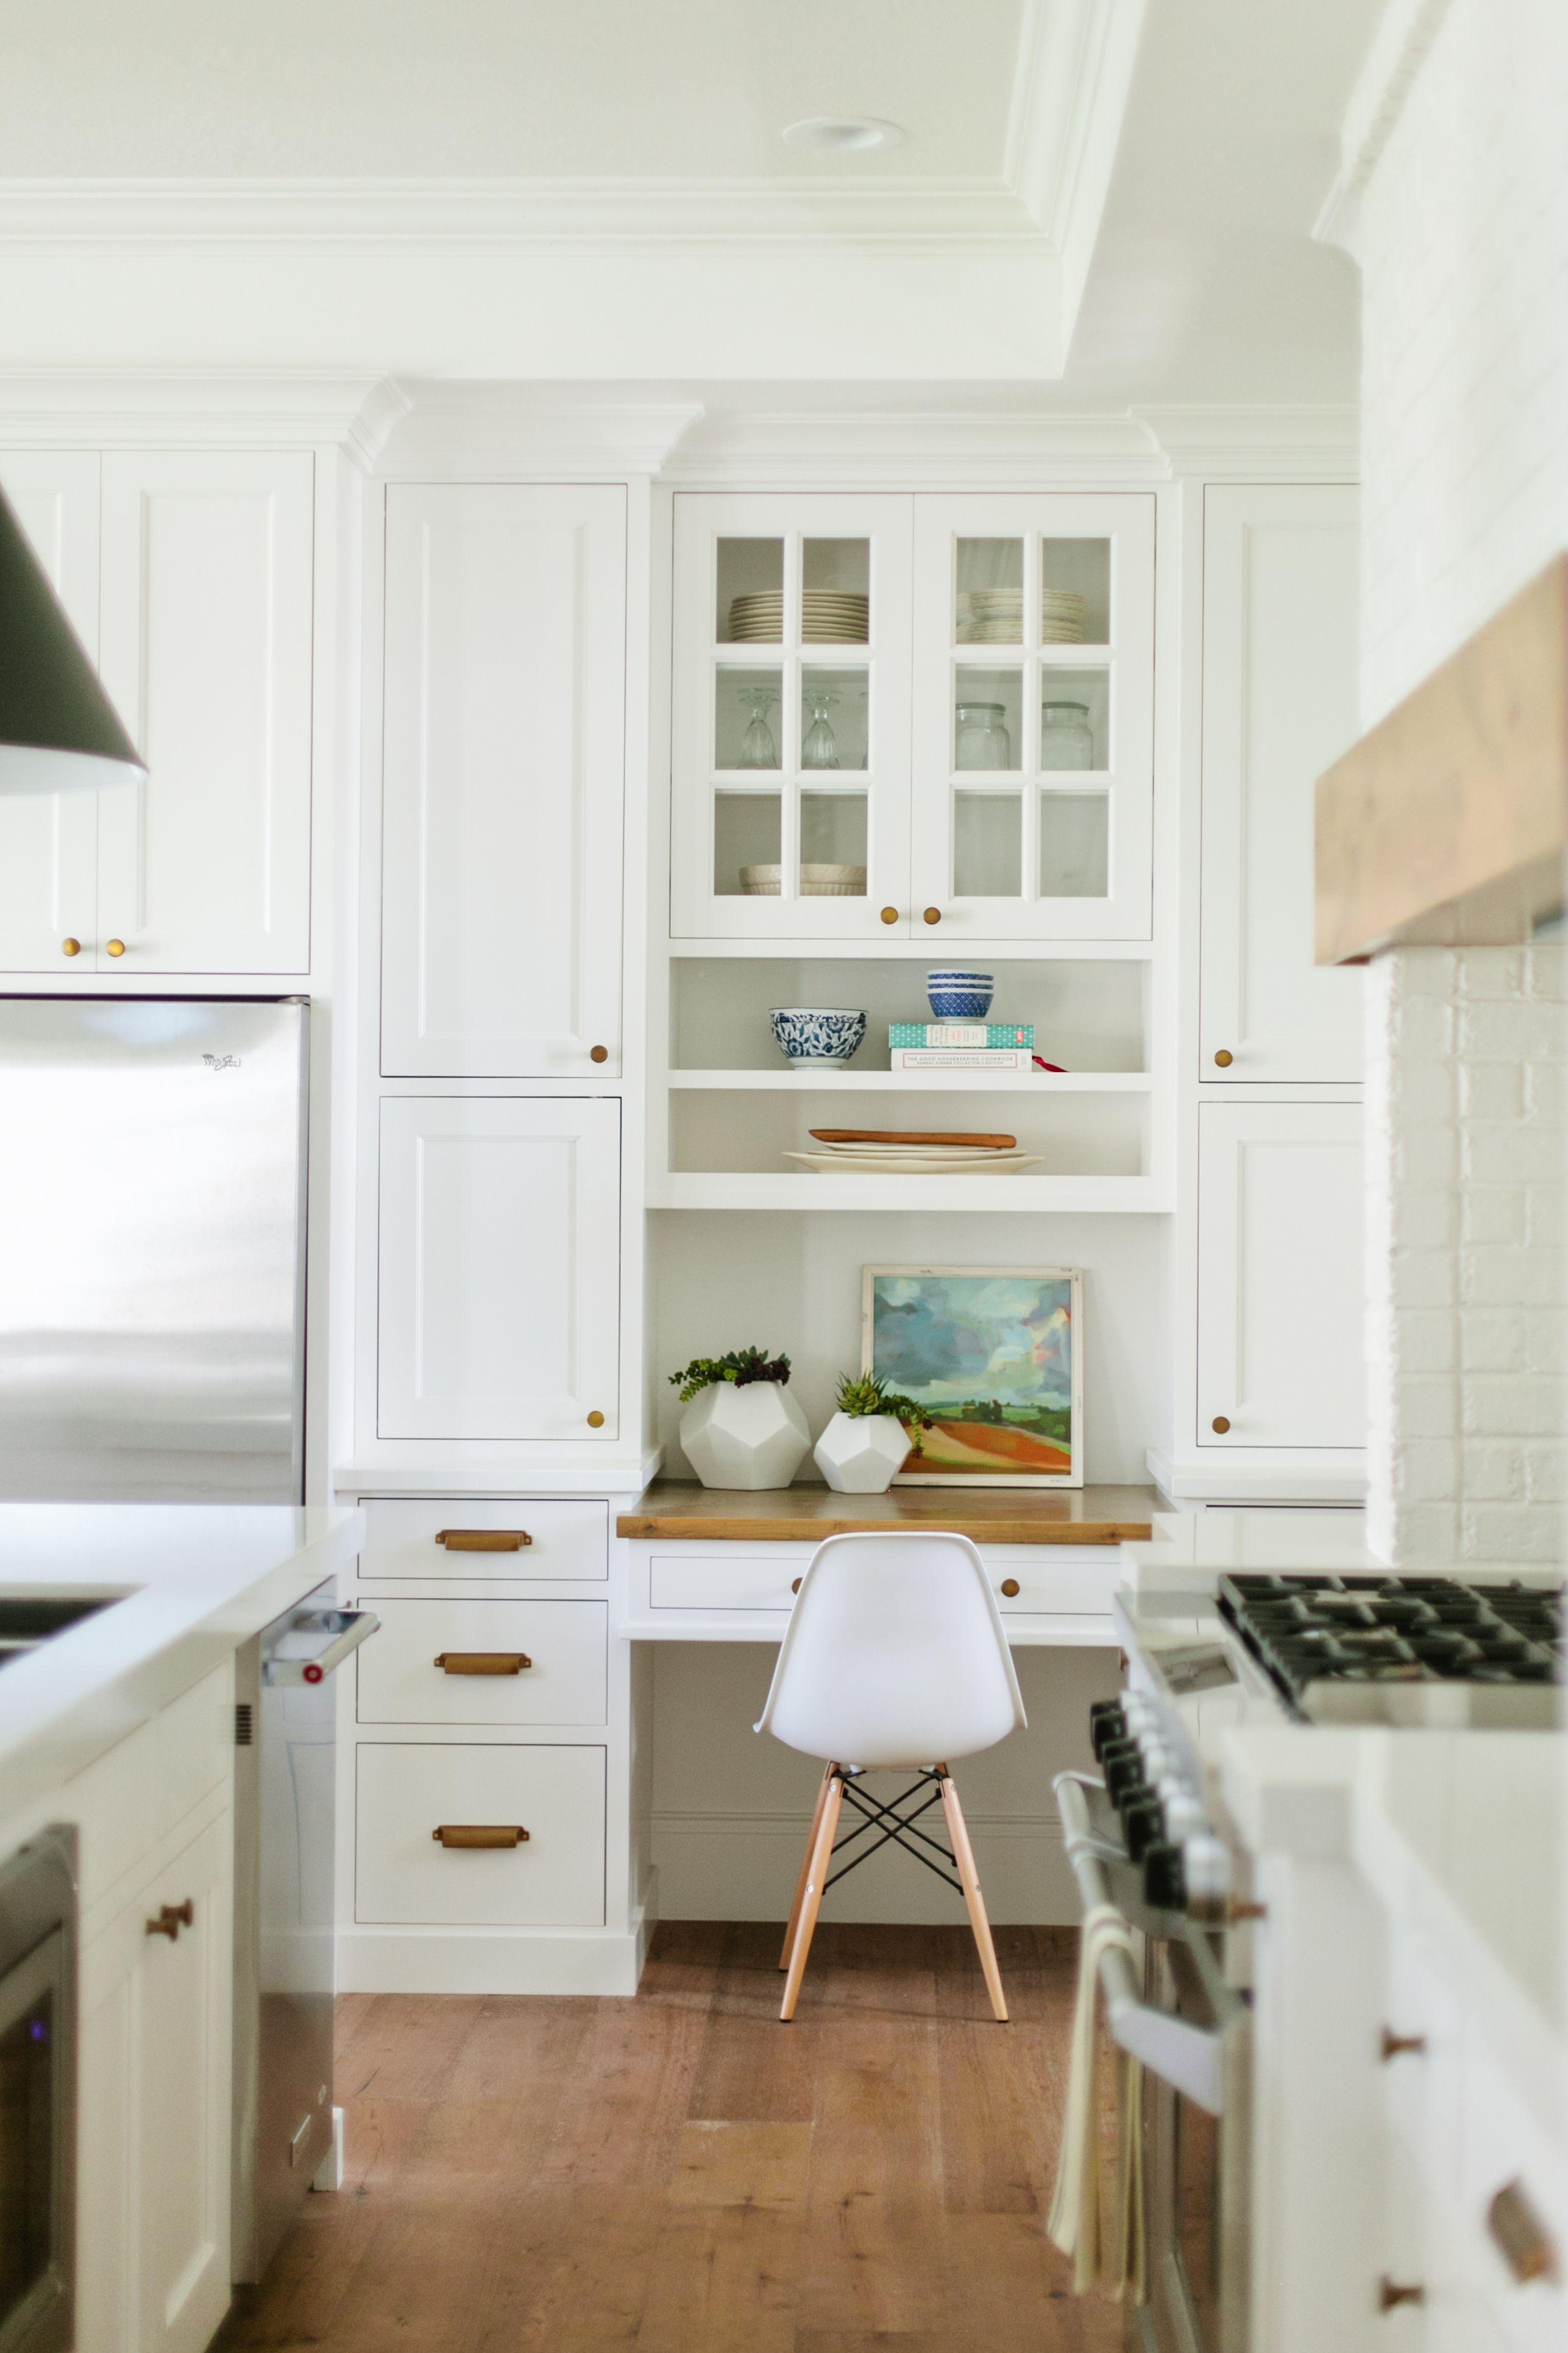 The Modern Farmhouse Project Kitchen & Breakfast Nook  Kitchen